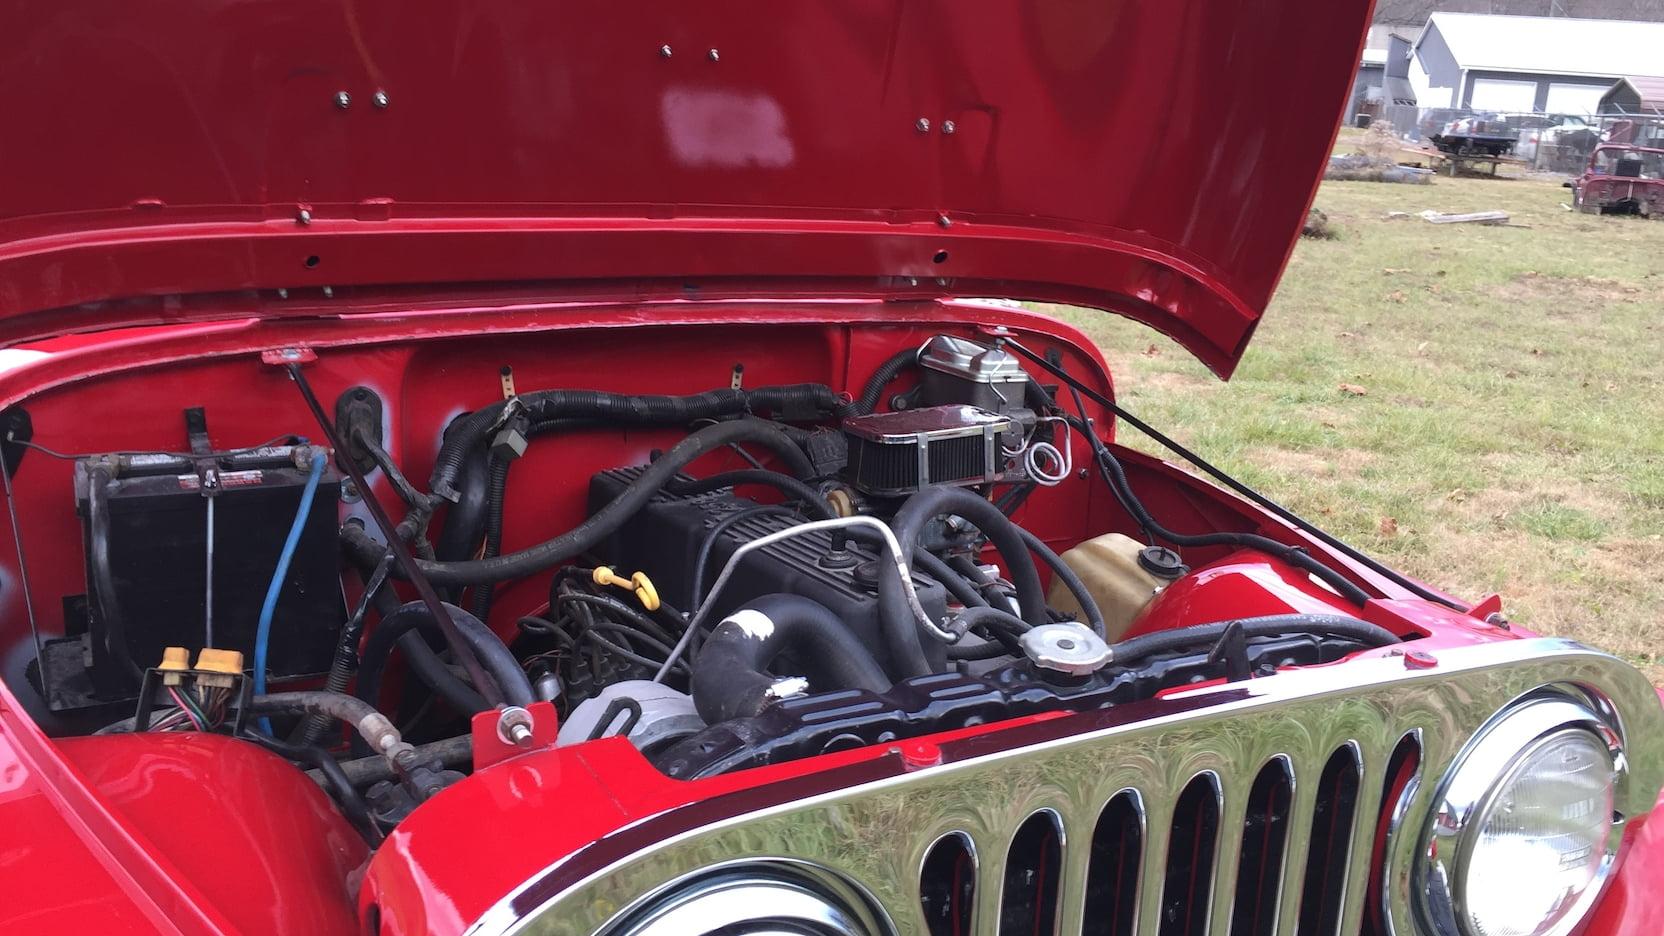 1984 Jeep Scrambler engine